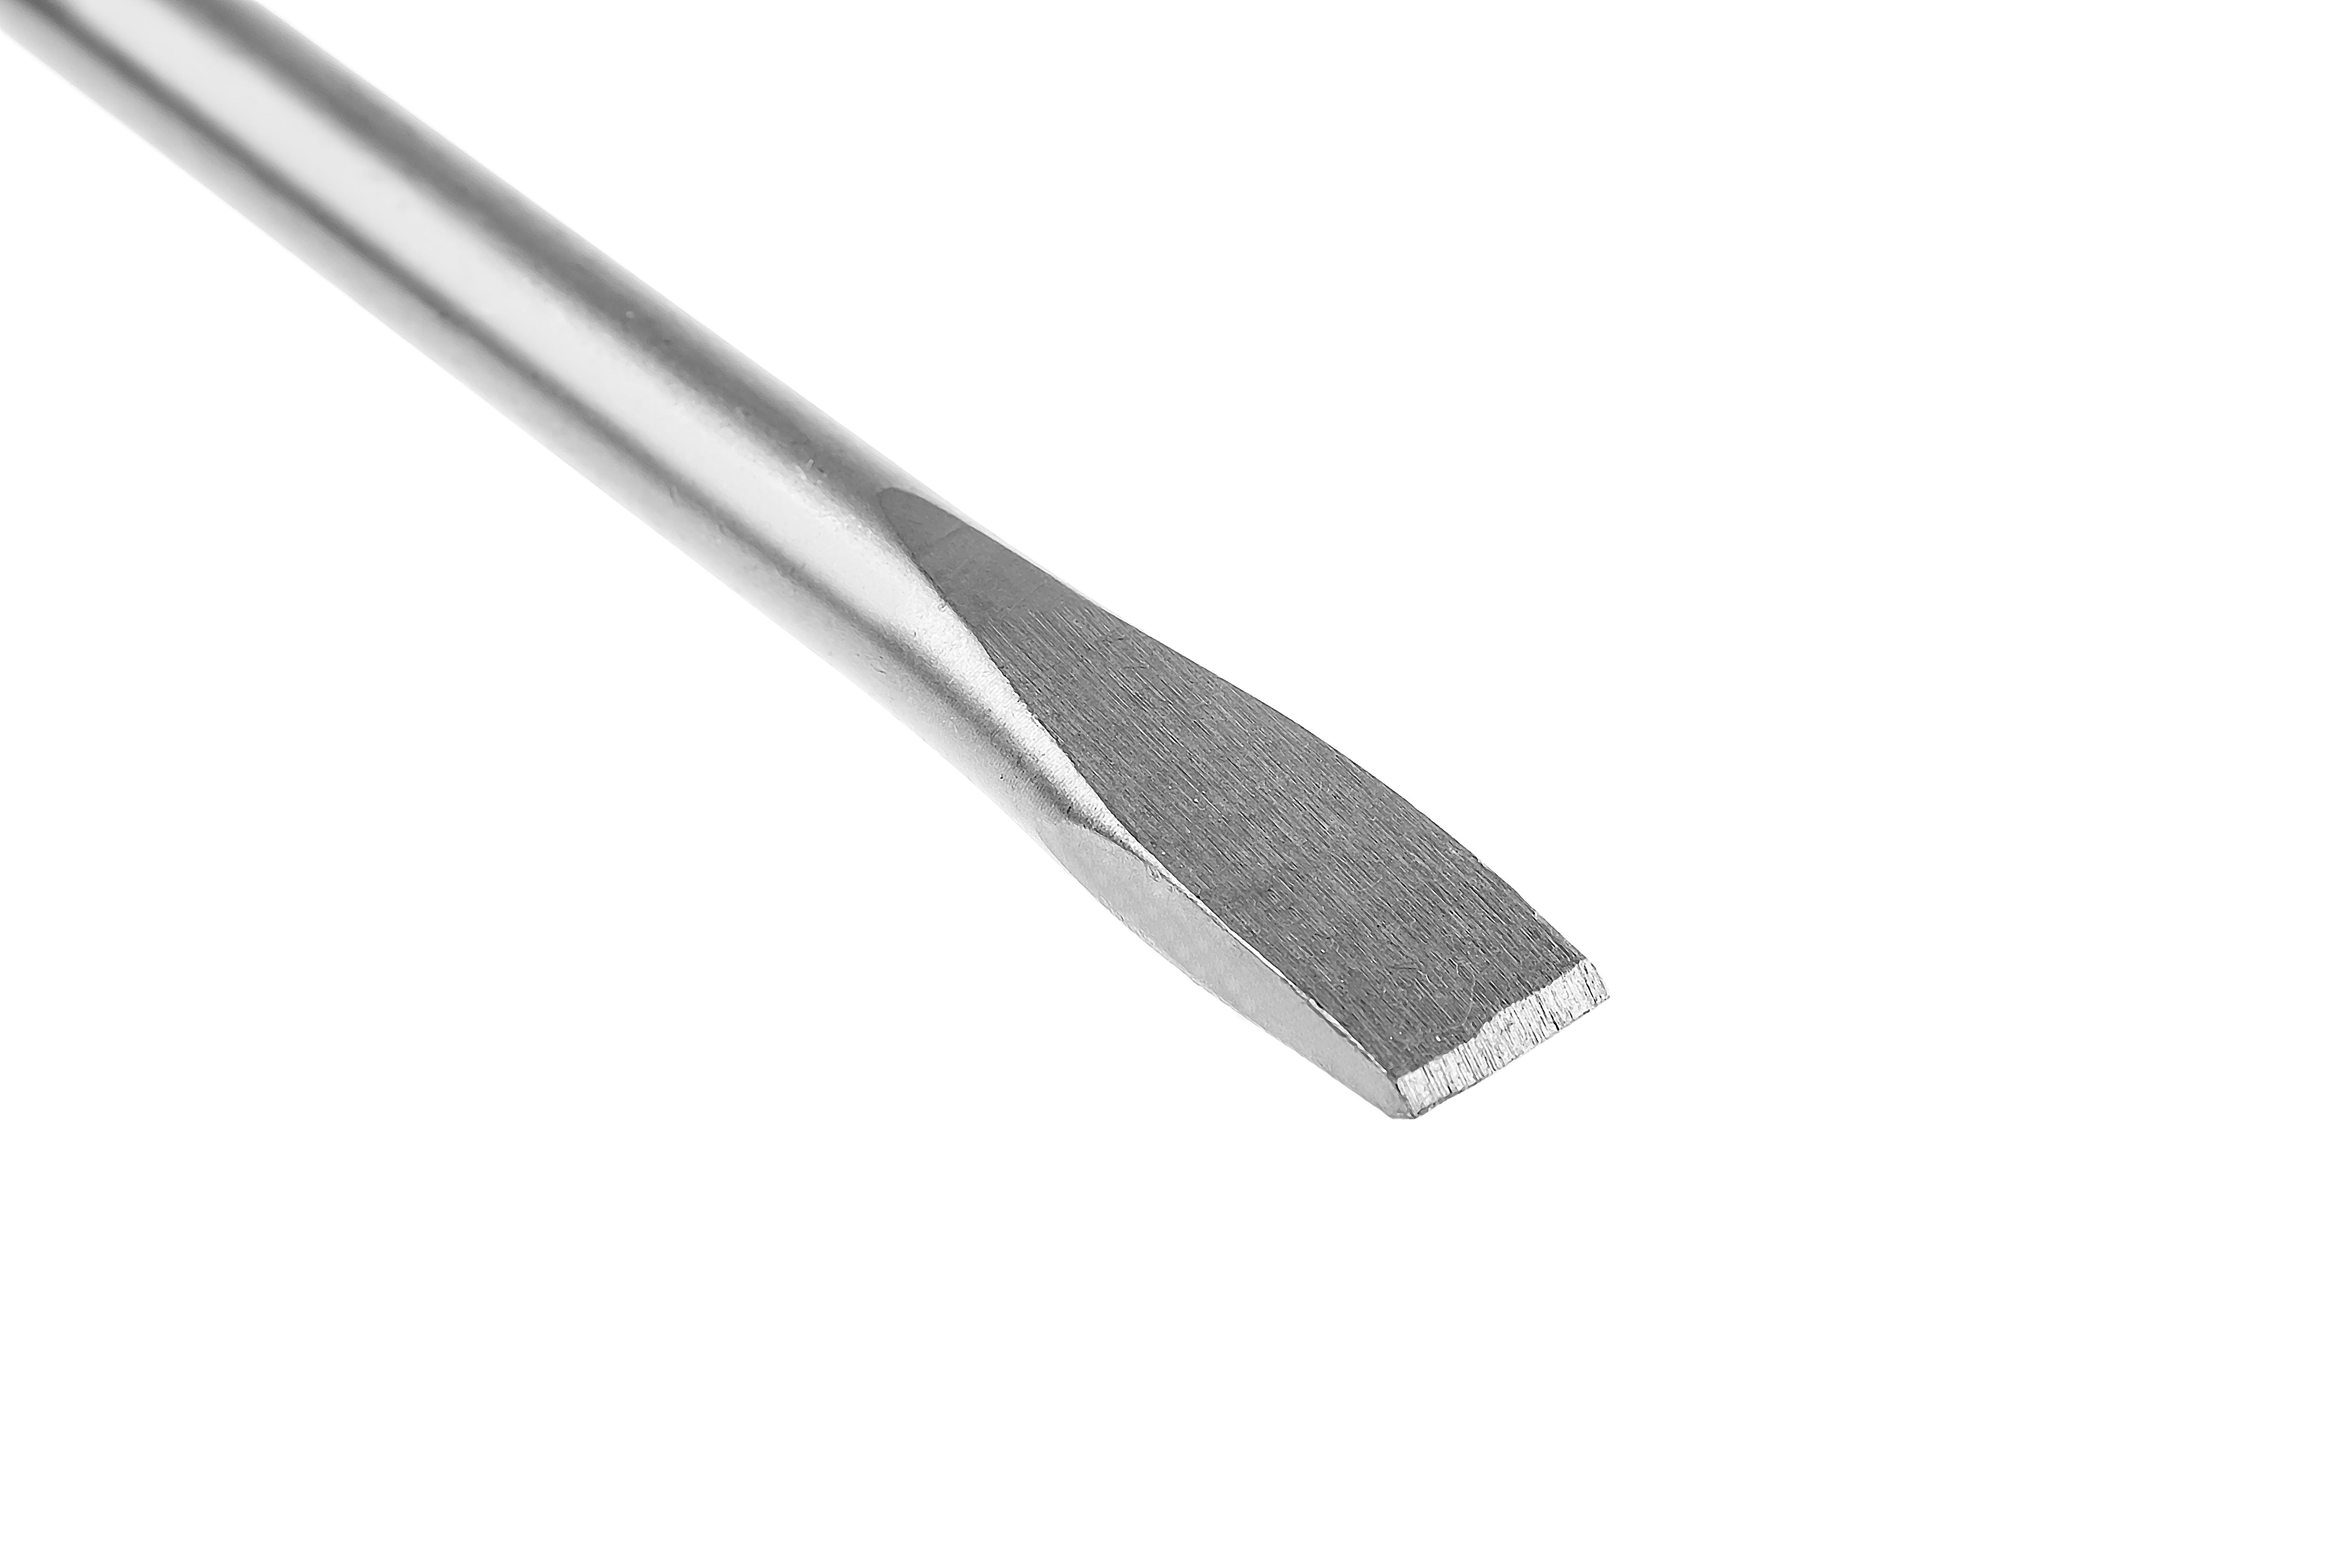 Зубило Hammer Dr ch sds-max плоское 18*280*25мм зубило sturm 9018 sds f40x250